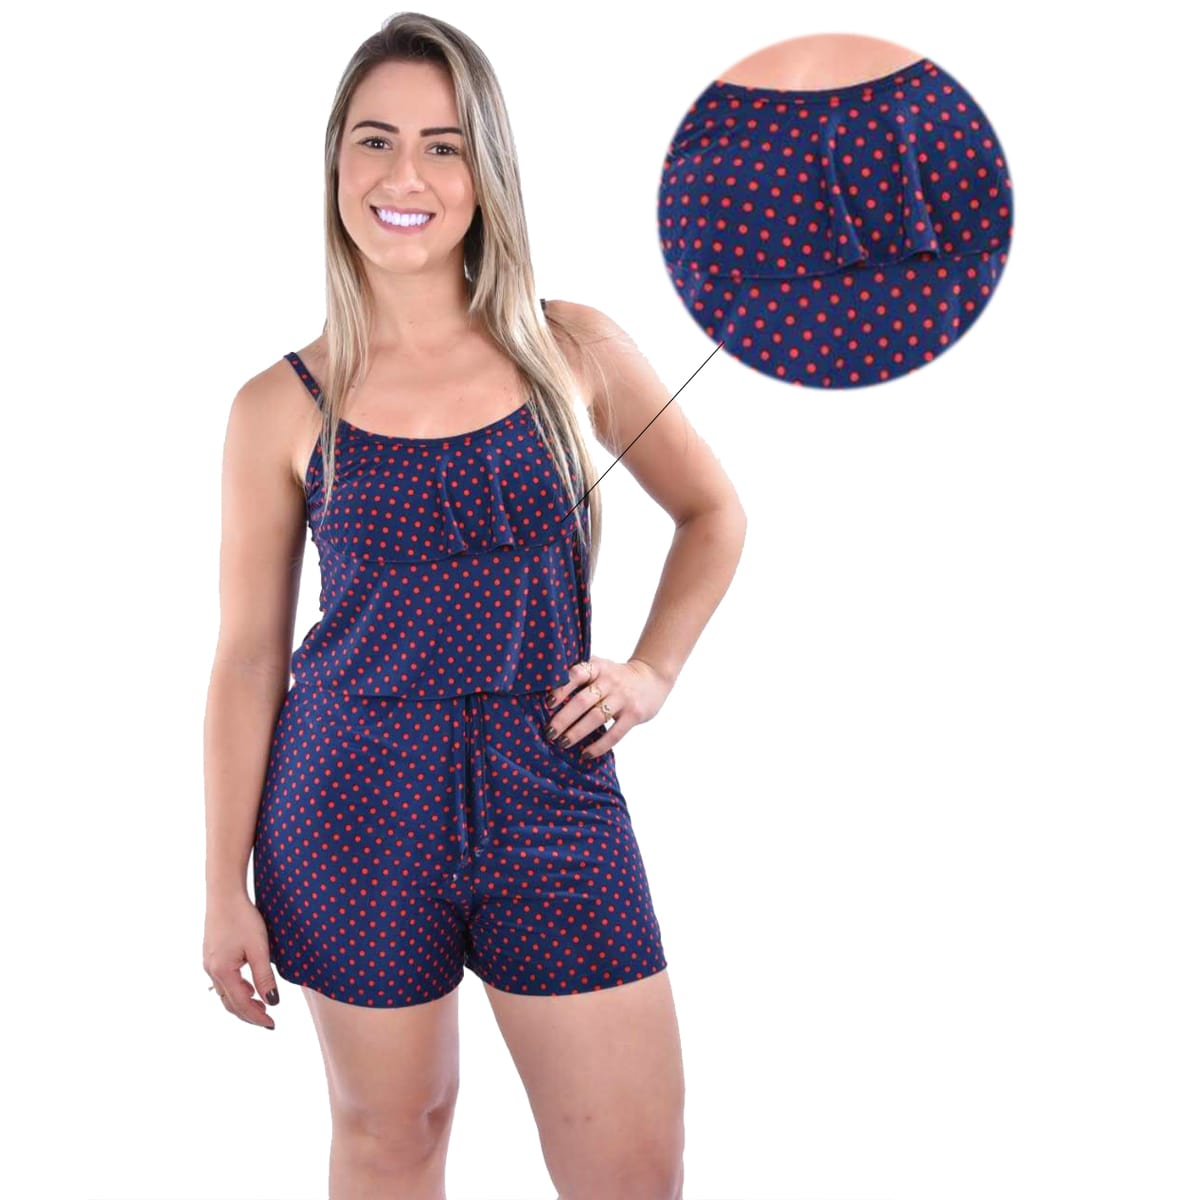 Macaquinho Pijama Liganete Adulto Feminino Ref: 2007